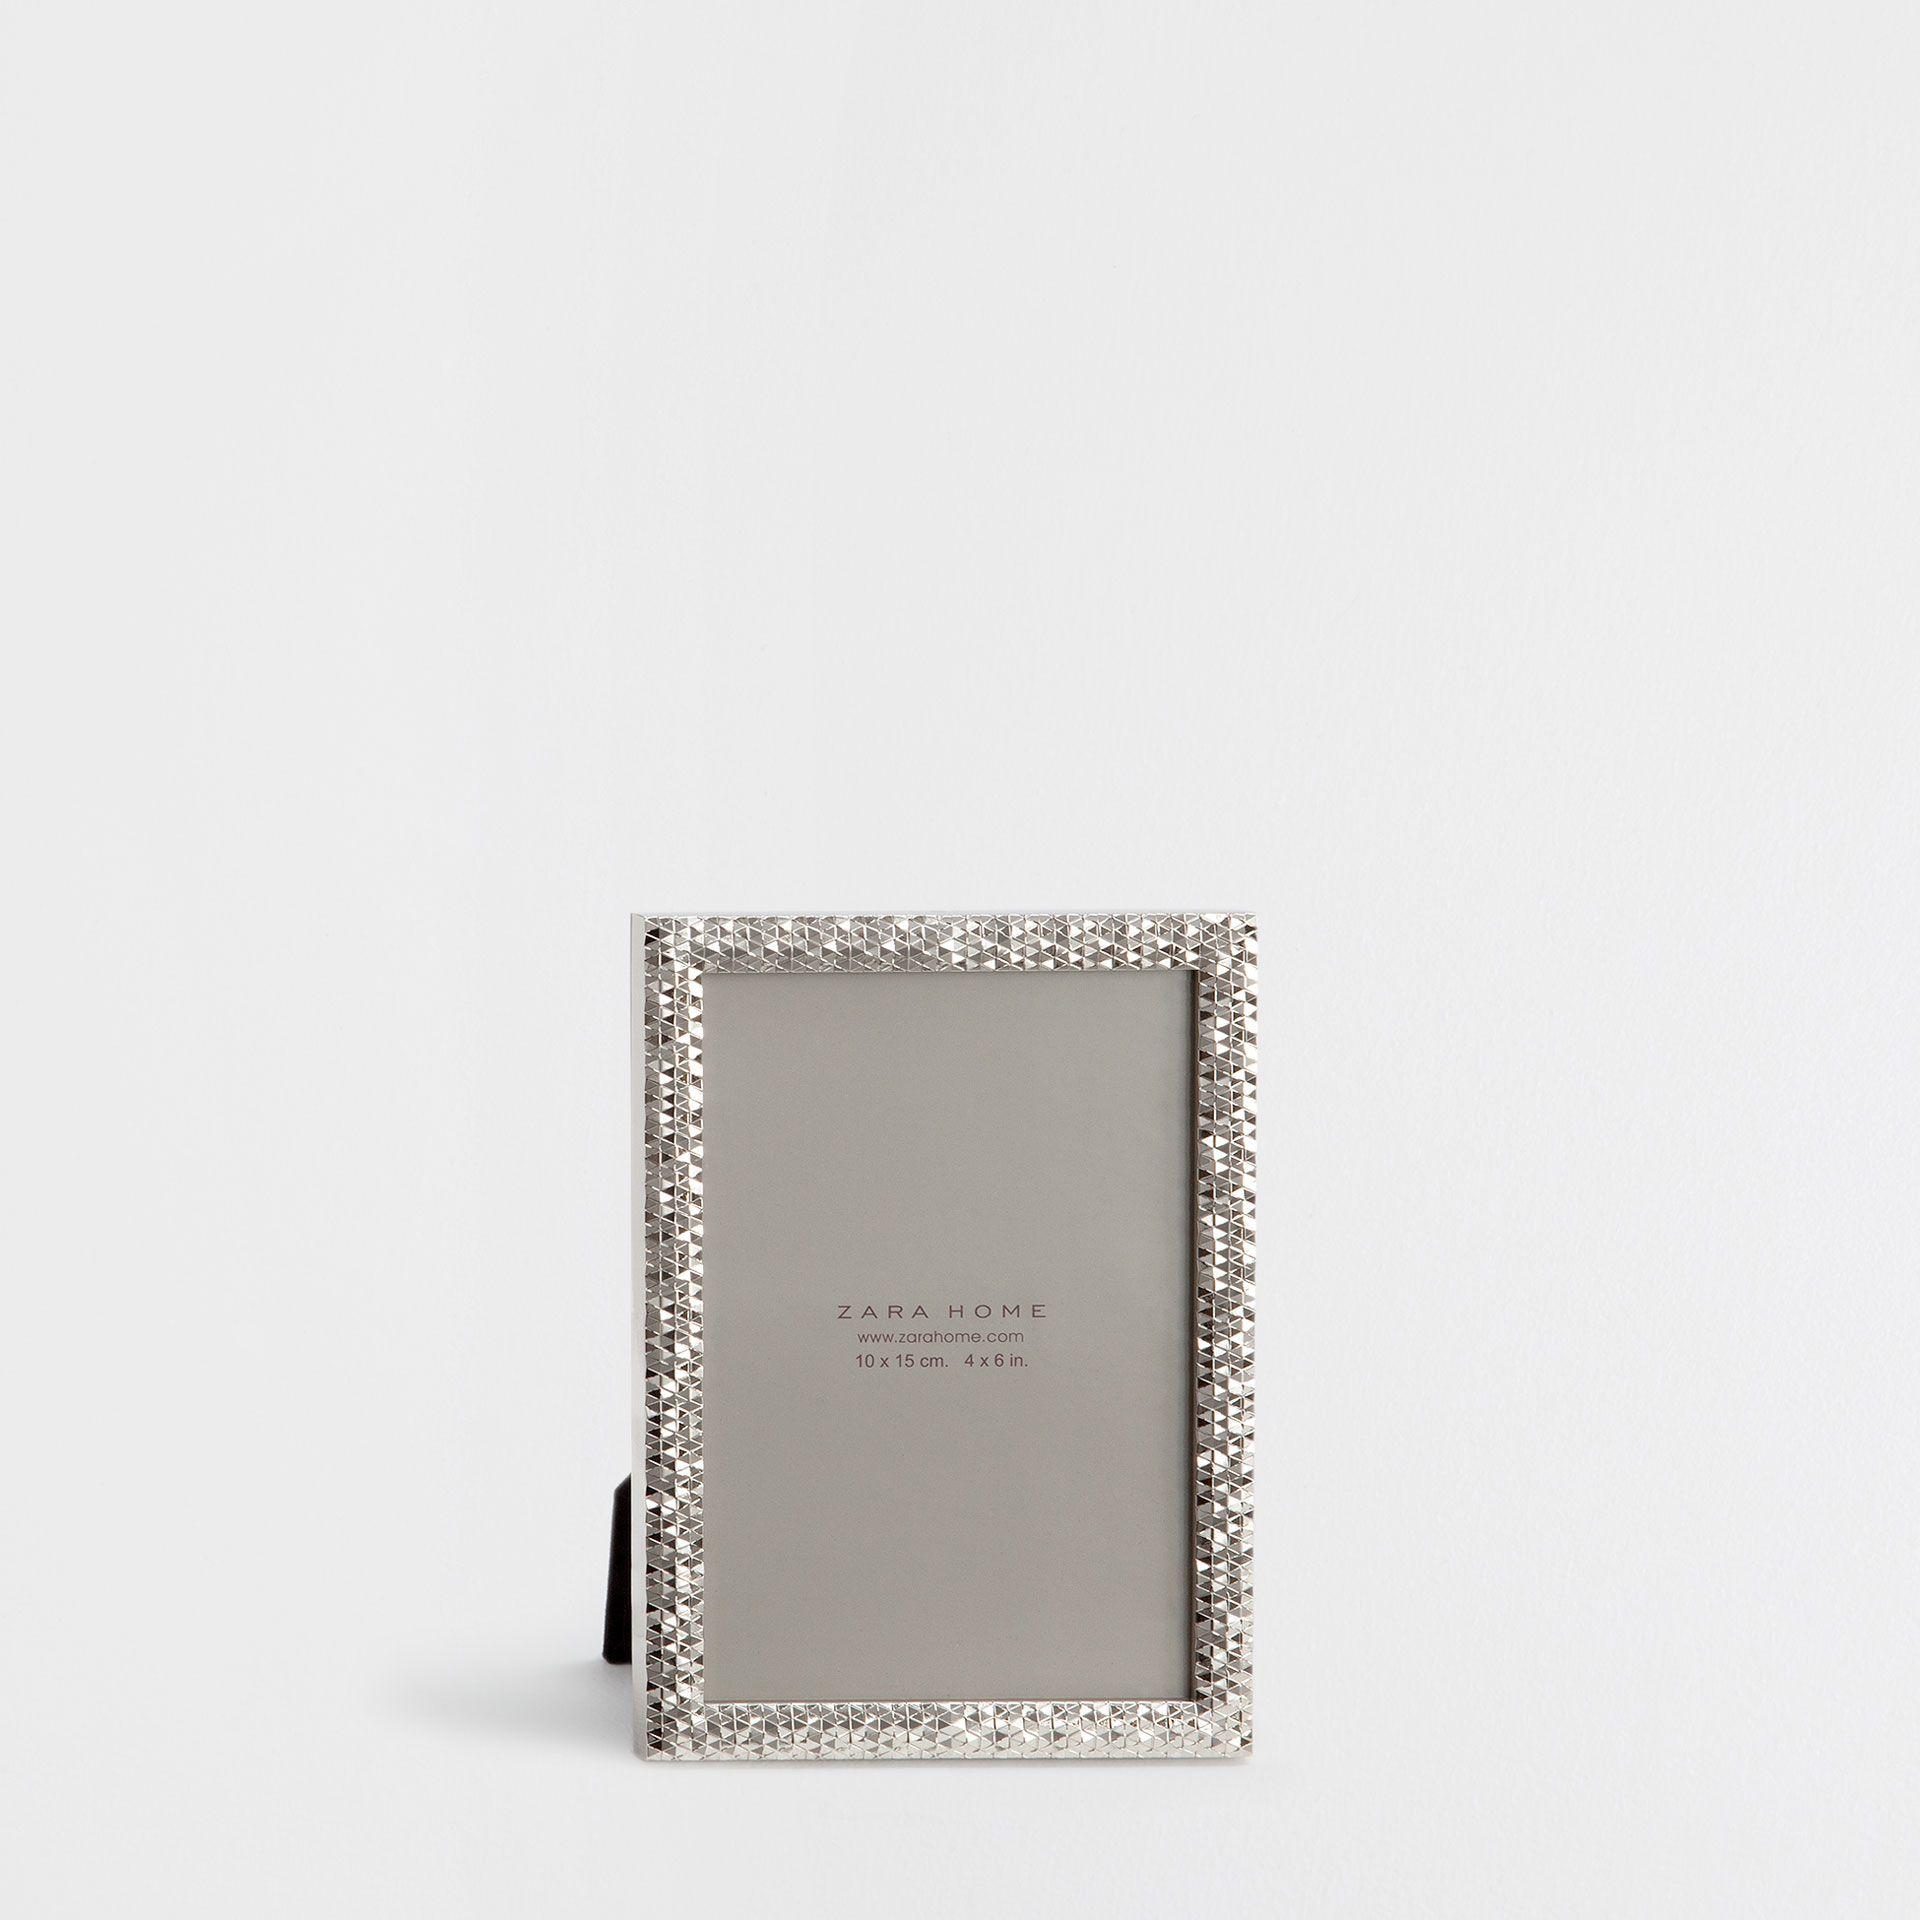 Faceted Metal Frame   Underwater Collection   DECORATION | Zara Home  Hrvatska